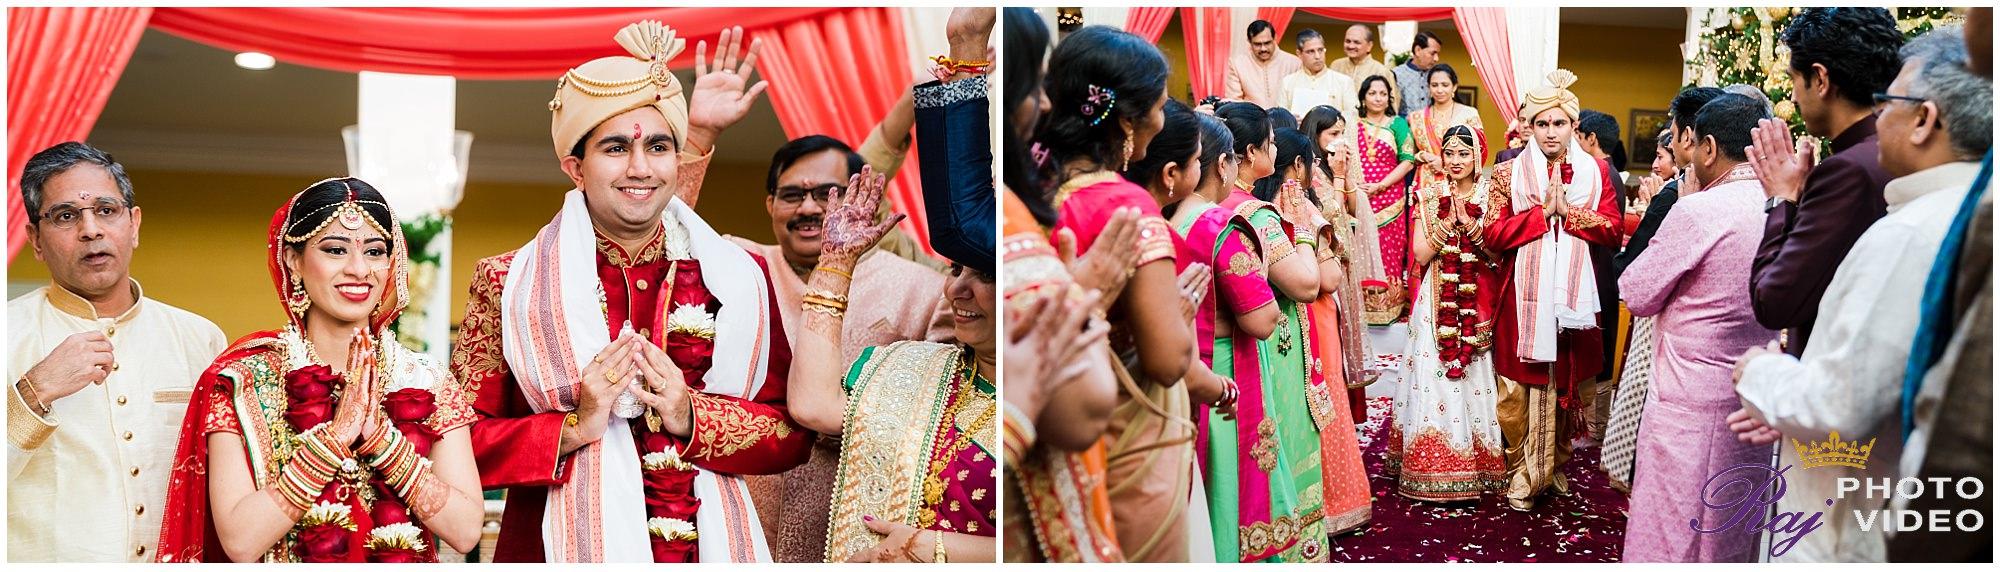 Founders-Inn-and-Spa-Virginia-Beach-VA-Indian-Wedding-Harini-Vivek-51.jpg